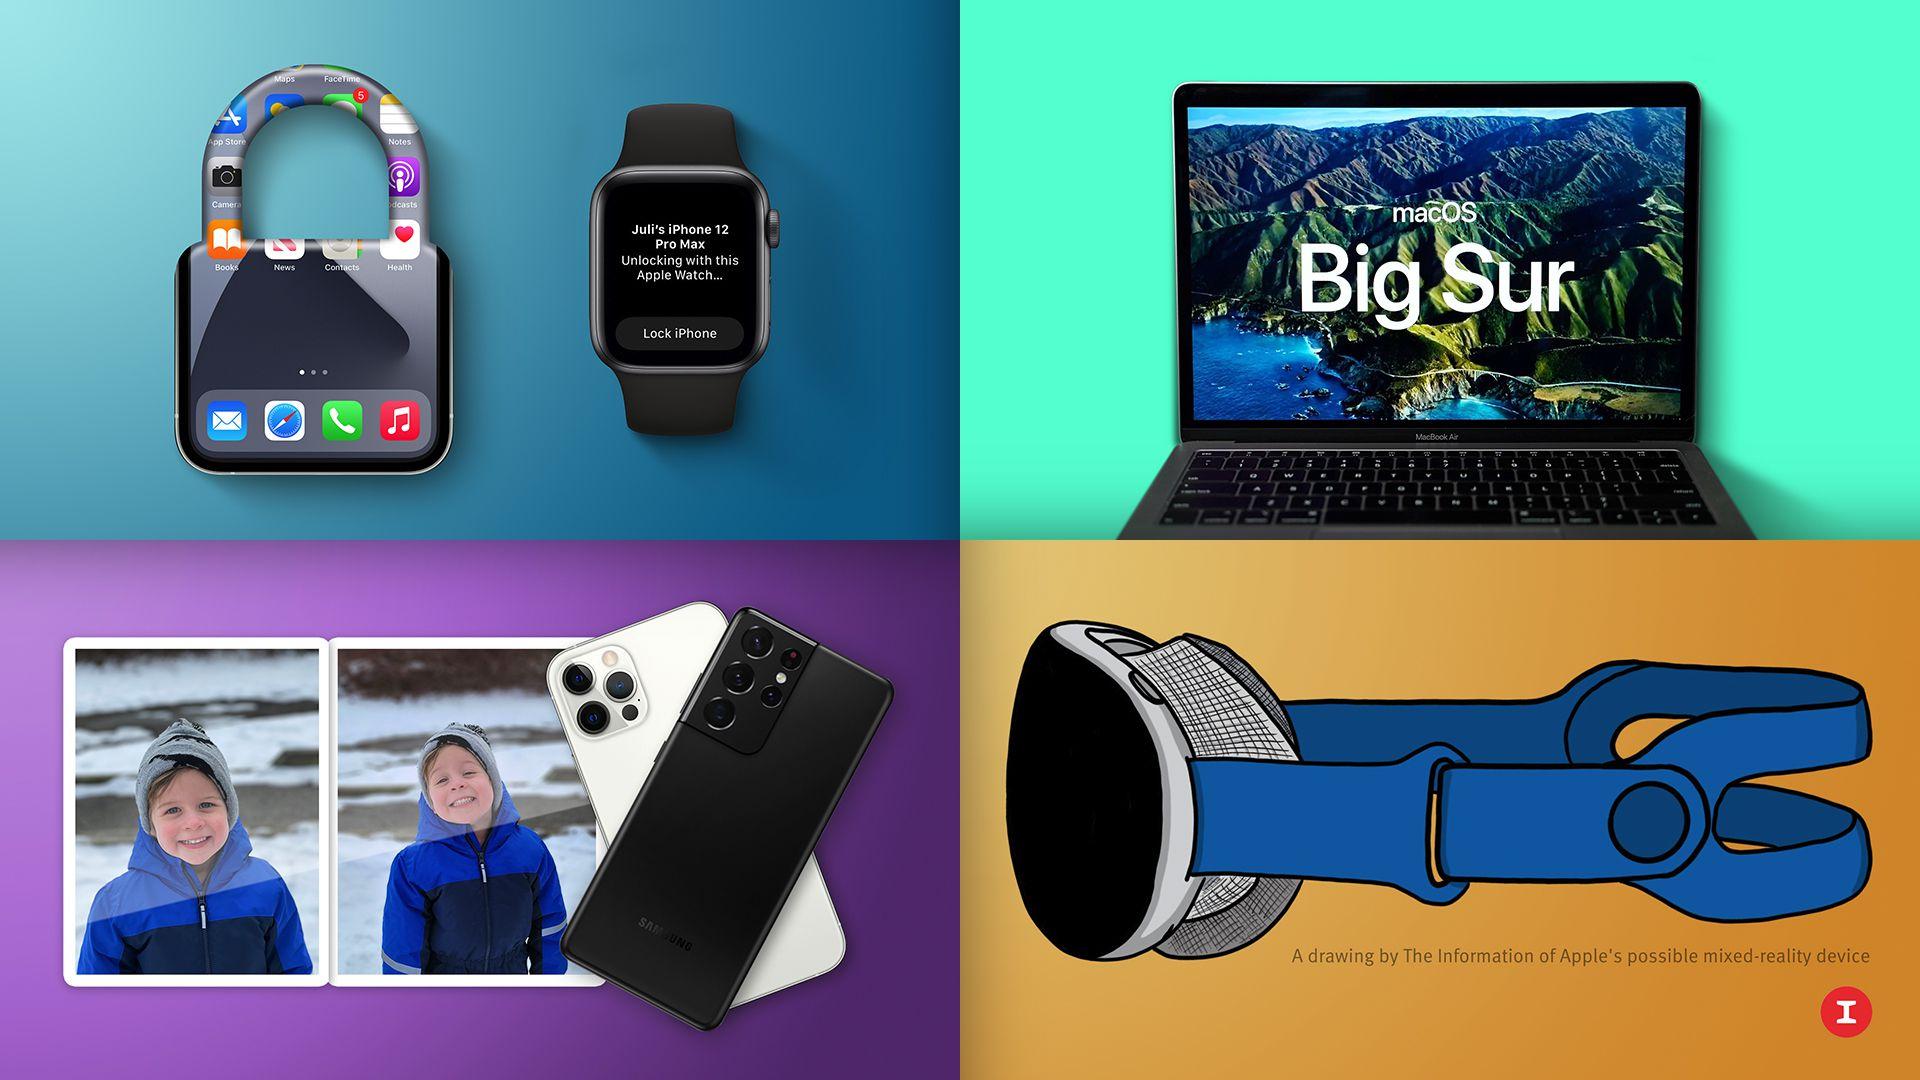 Top Stories: iOS 14.5 Beta, macOS 11.2 Released, VR Headset and Apple Car Rumors